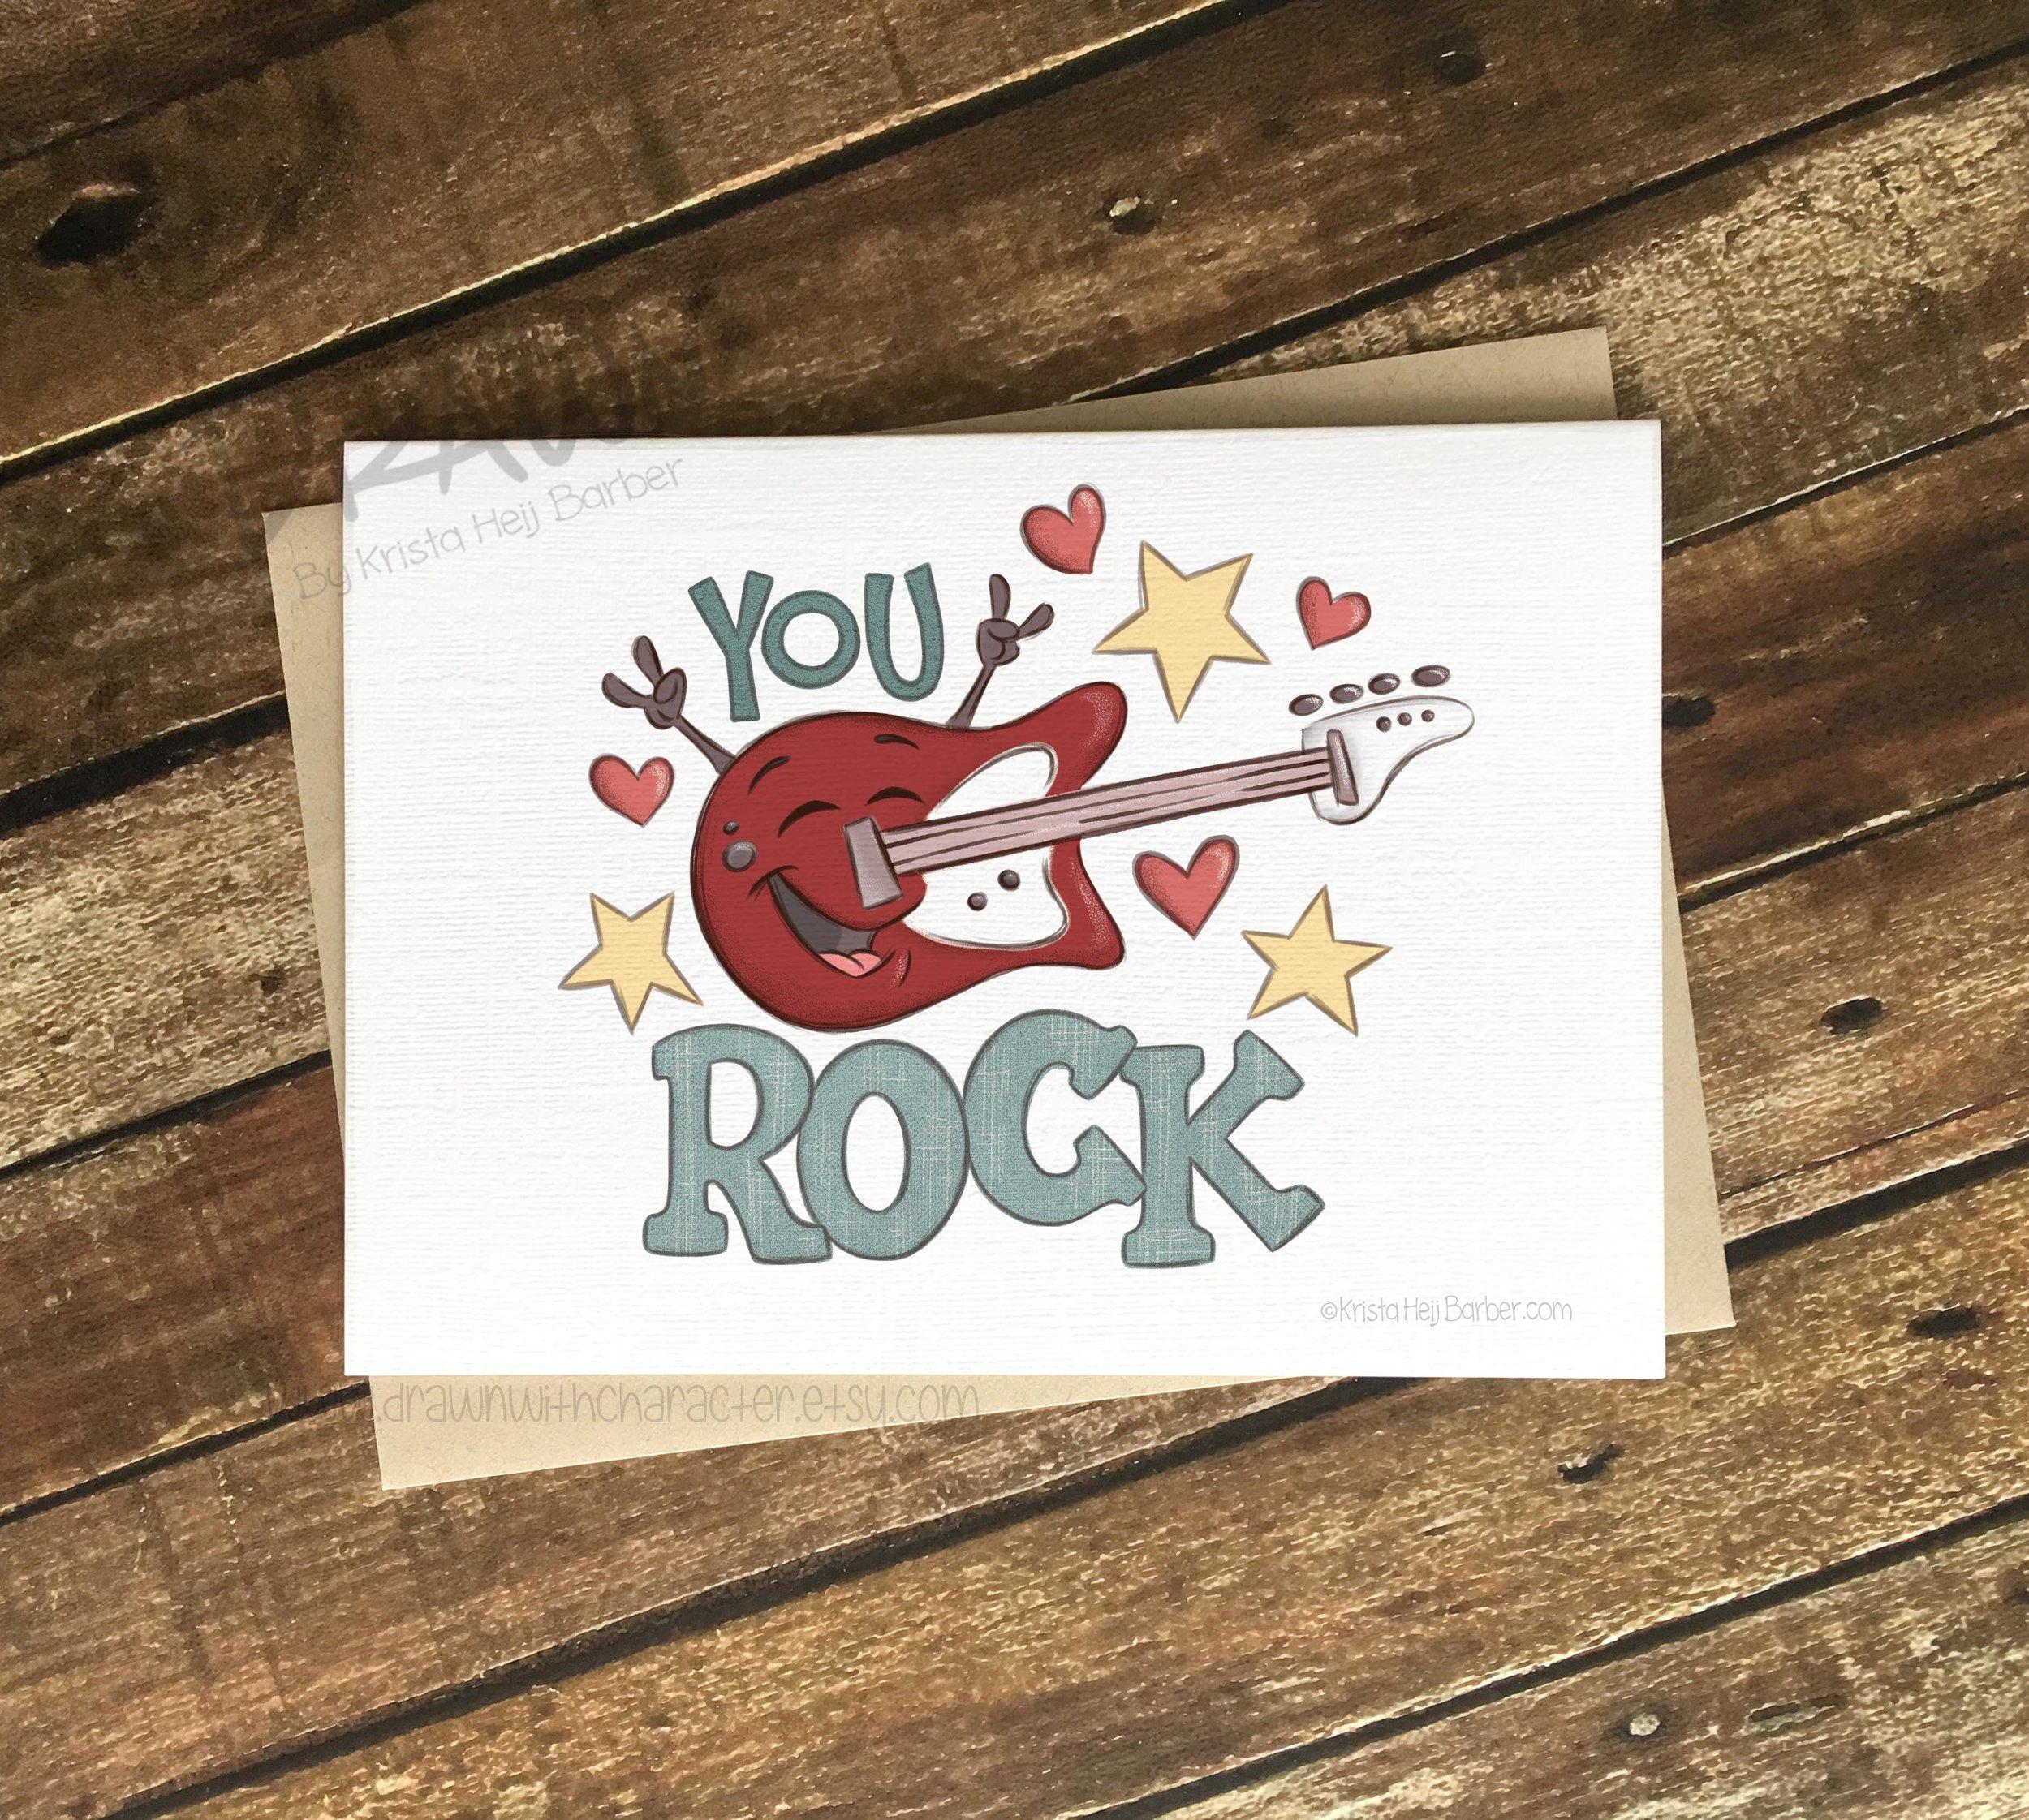 You Rock Ad.jpg